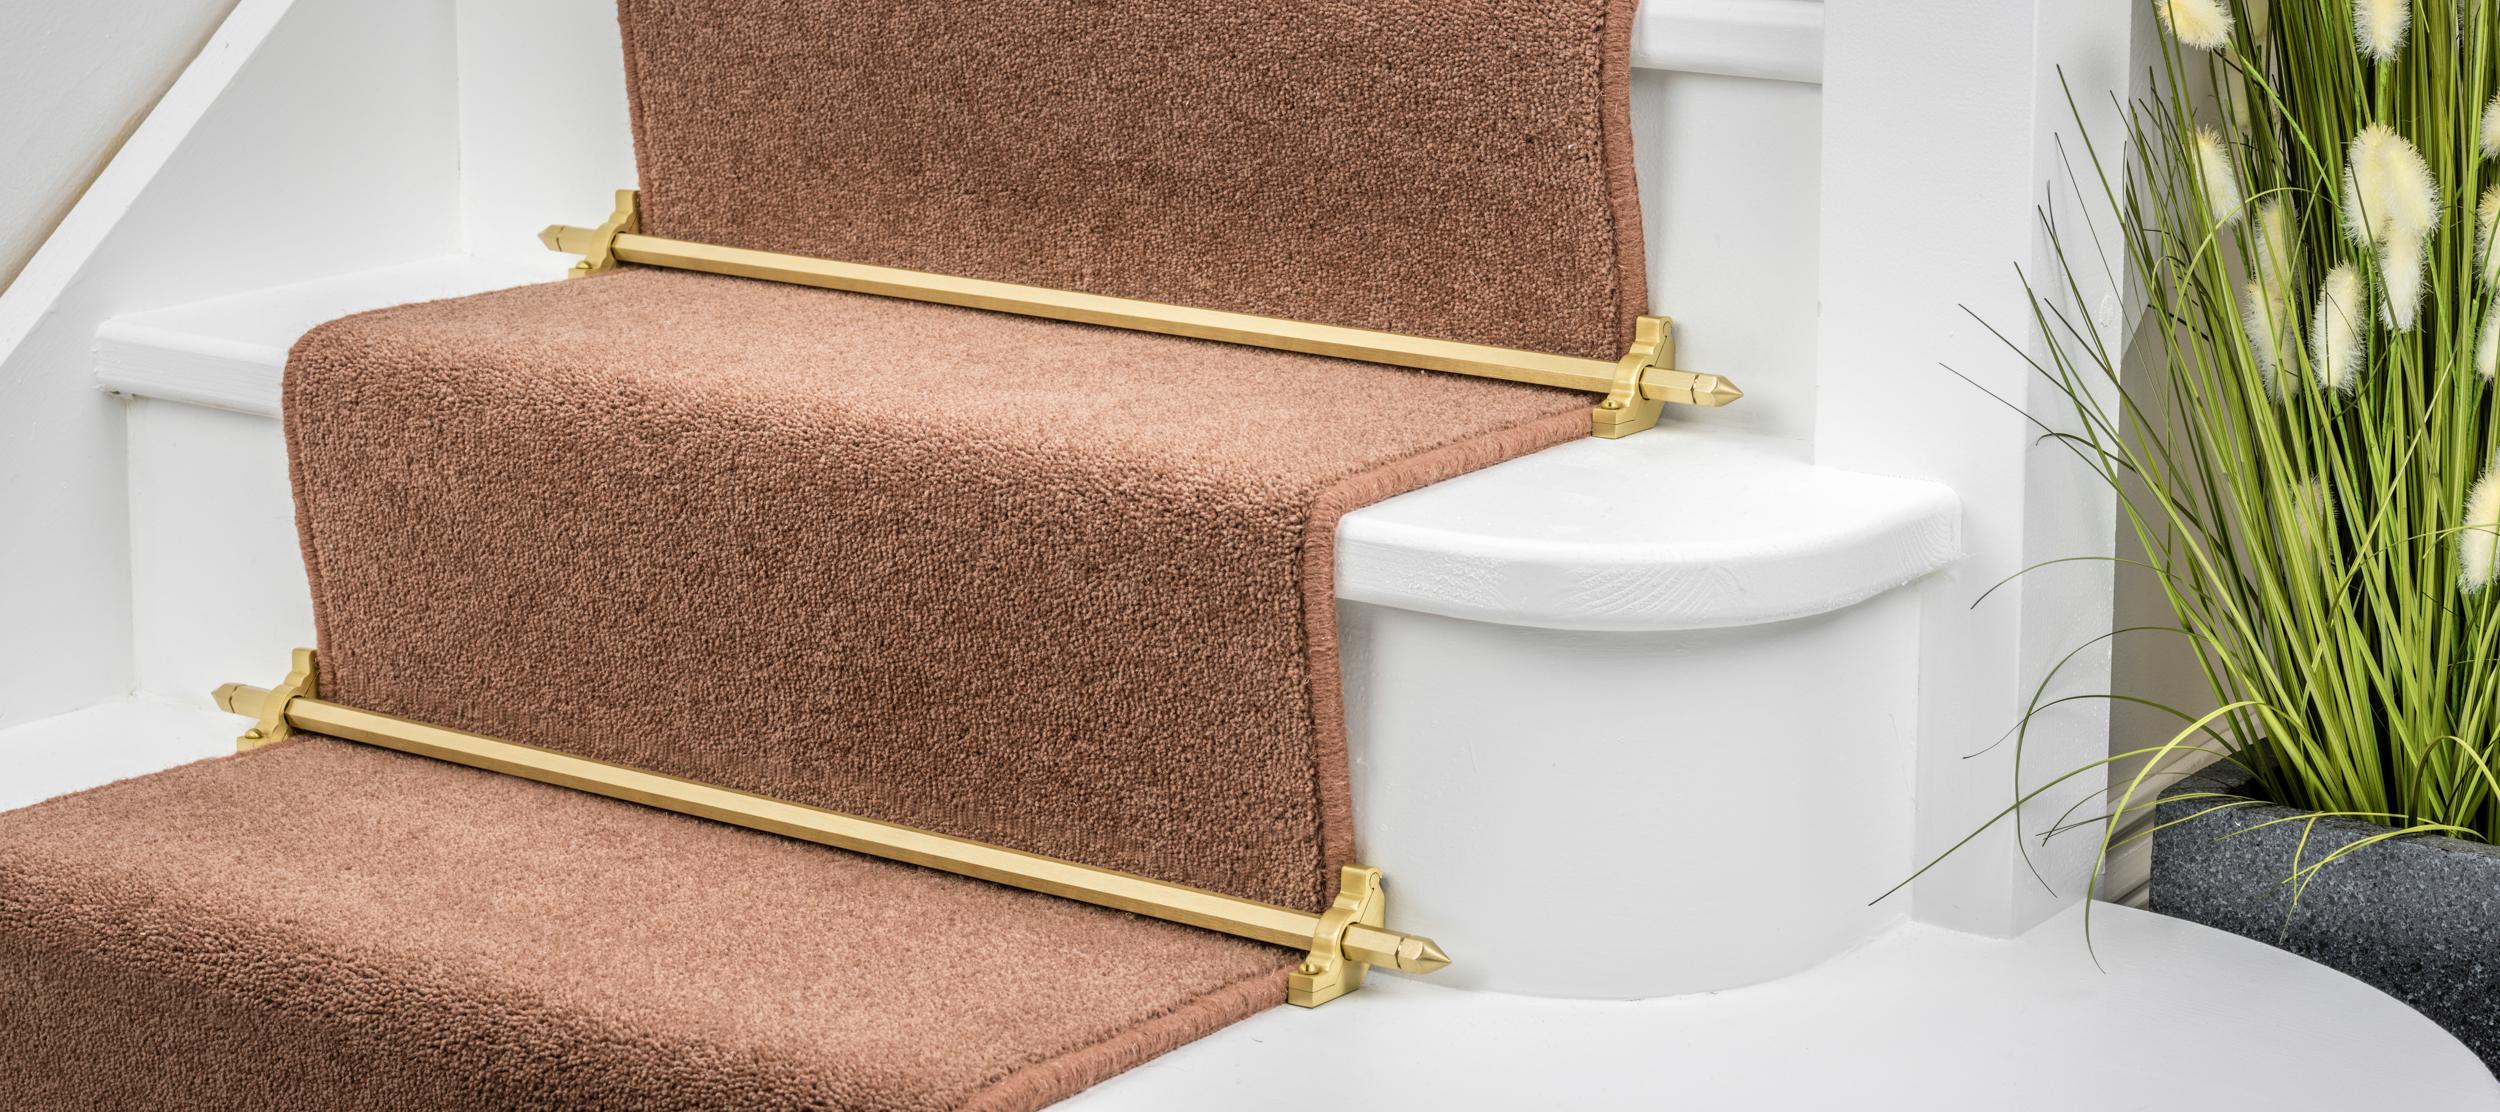 stairrods-satin-brass-hanover.jpg